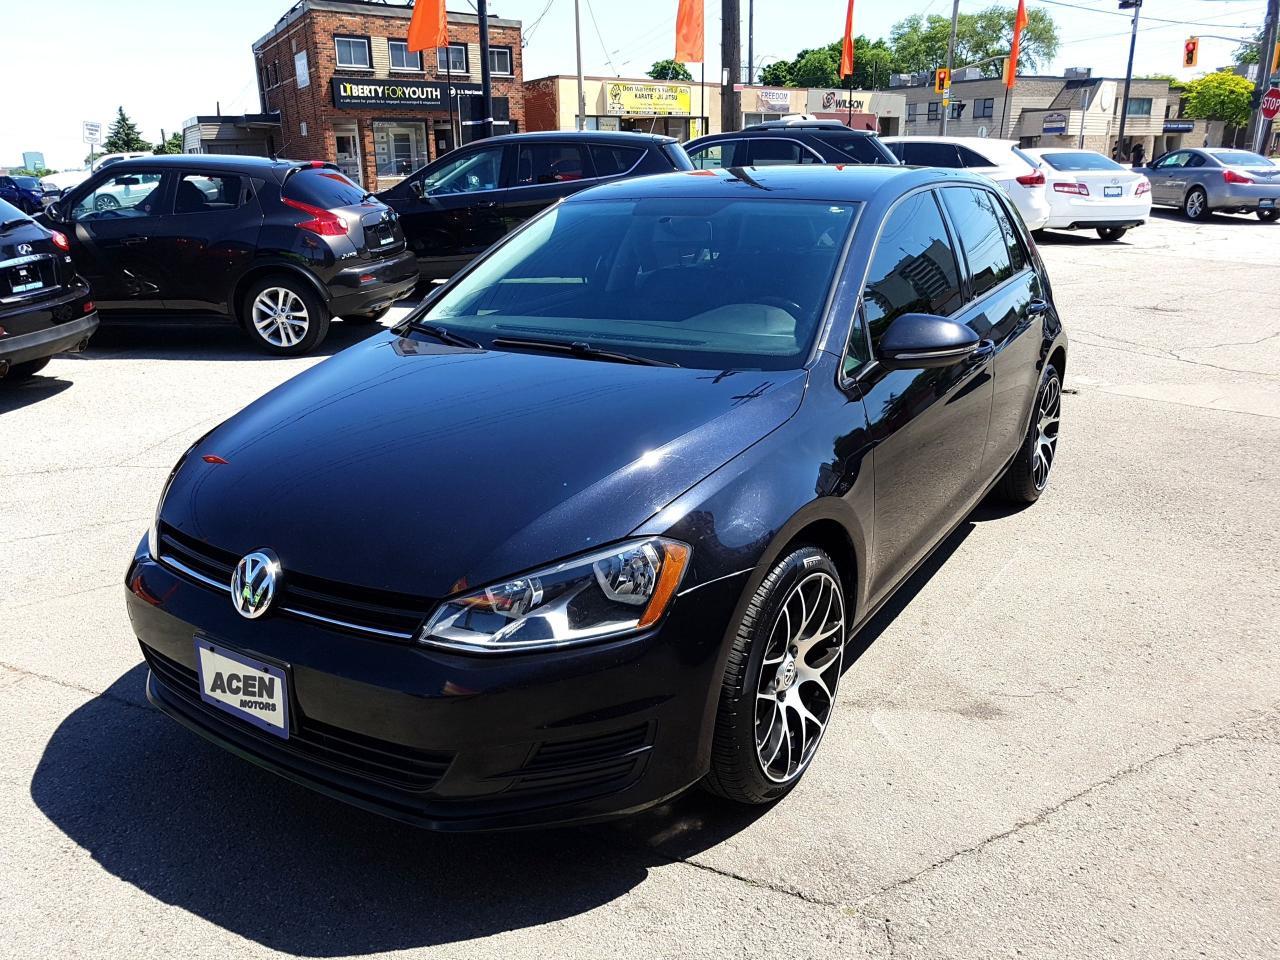 2016 Volkswagen Golf HB-LEATHER, ALLOY RIMS, BACKUP CAMERA.